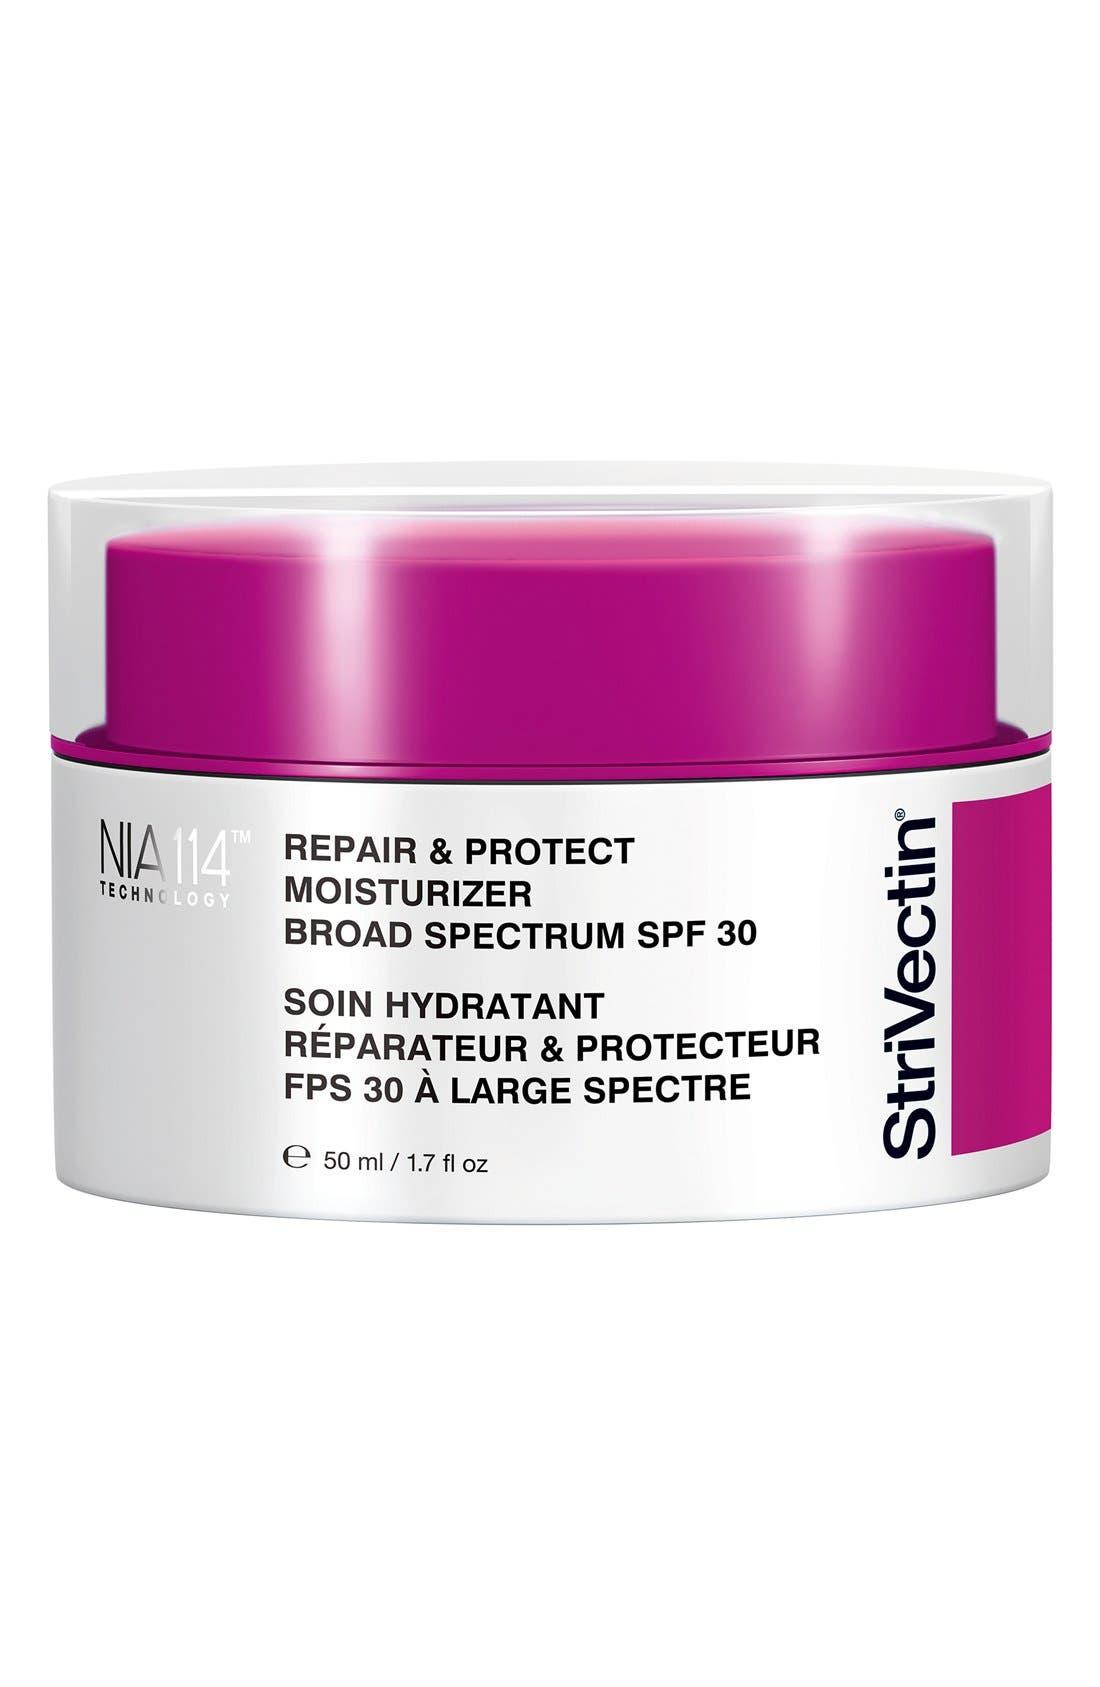 StriVectin® Repair & Protect Moisturizer Broad Spectrum SPF 30